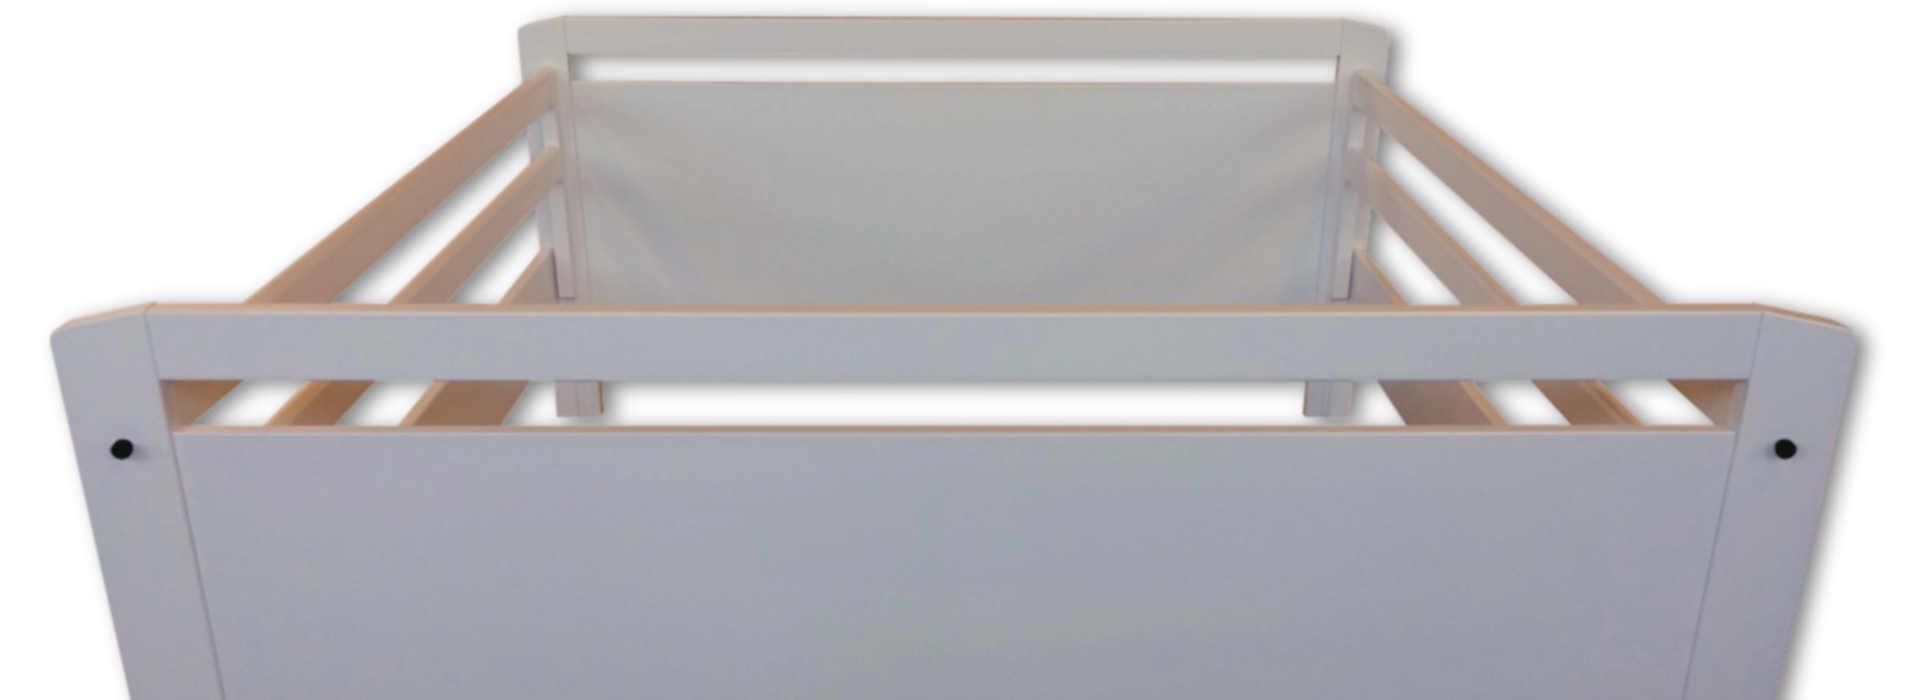 Sponde Letto Smart-Bed Deluxe versione a due piazze matrimoniale laccata bianca